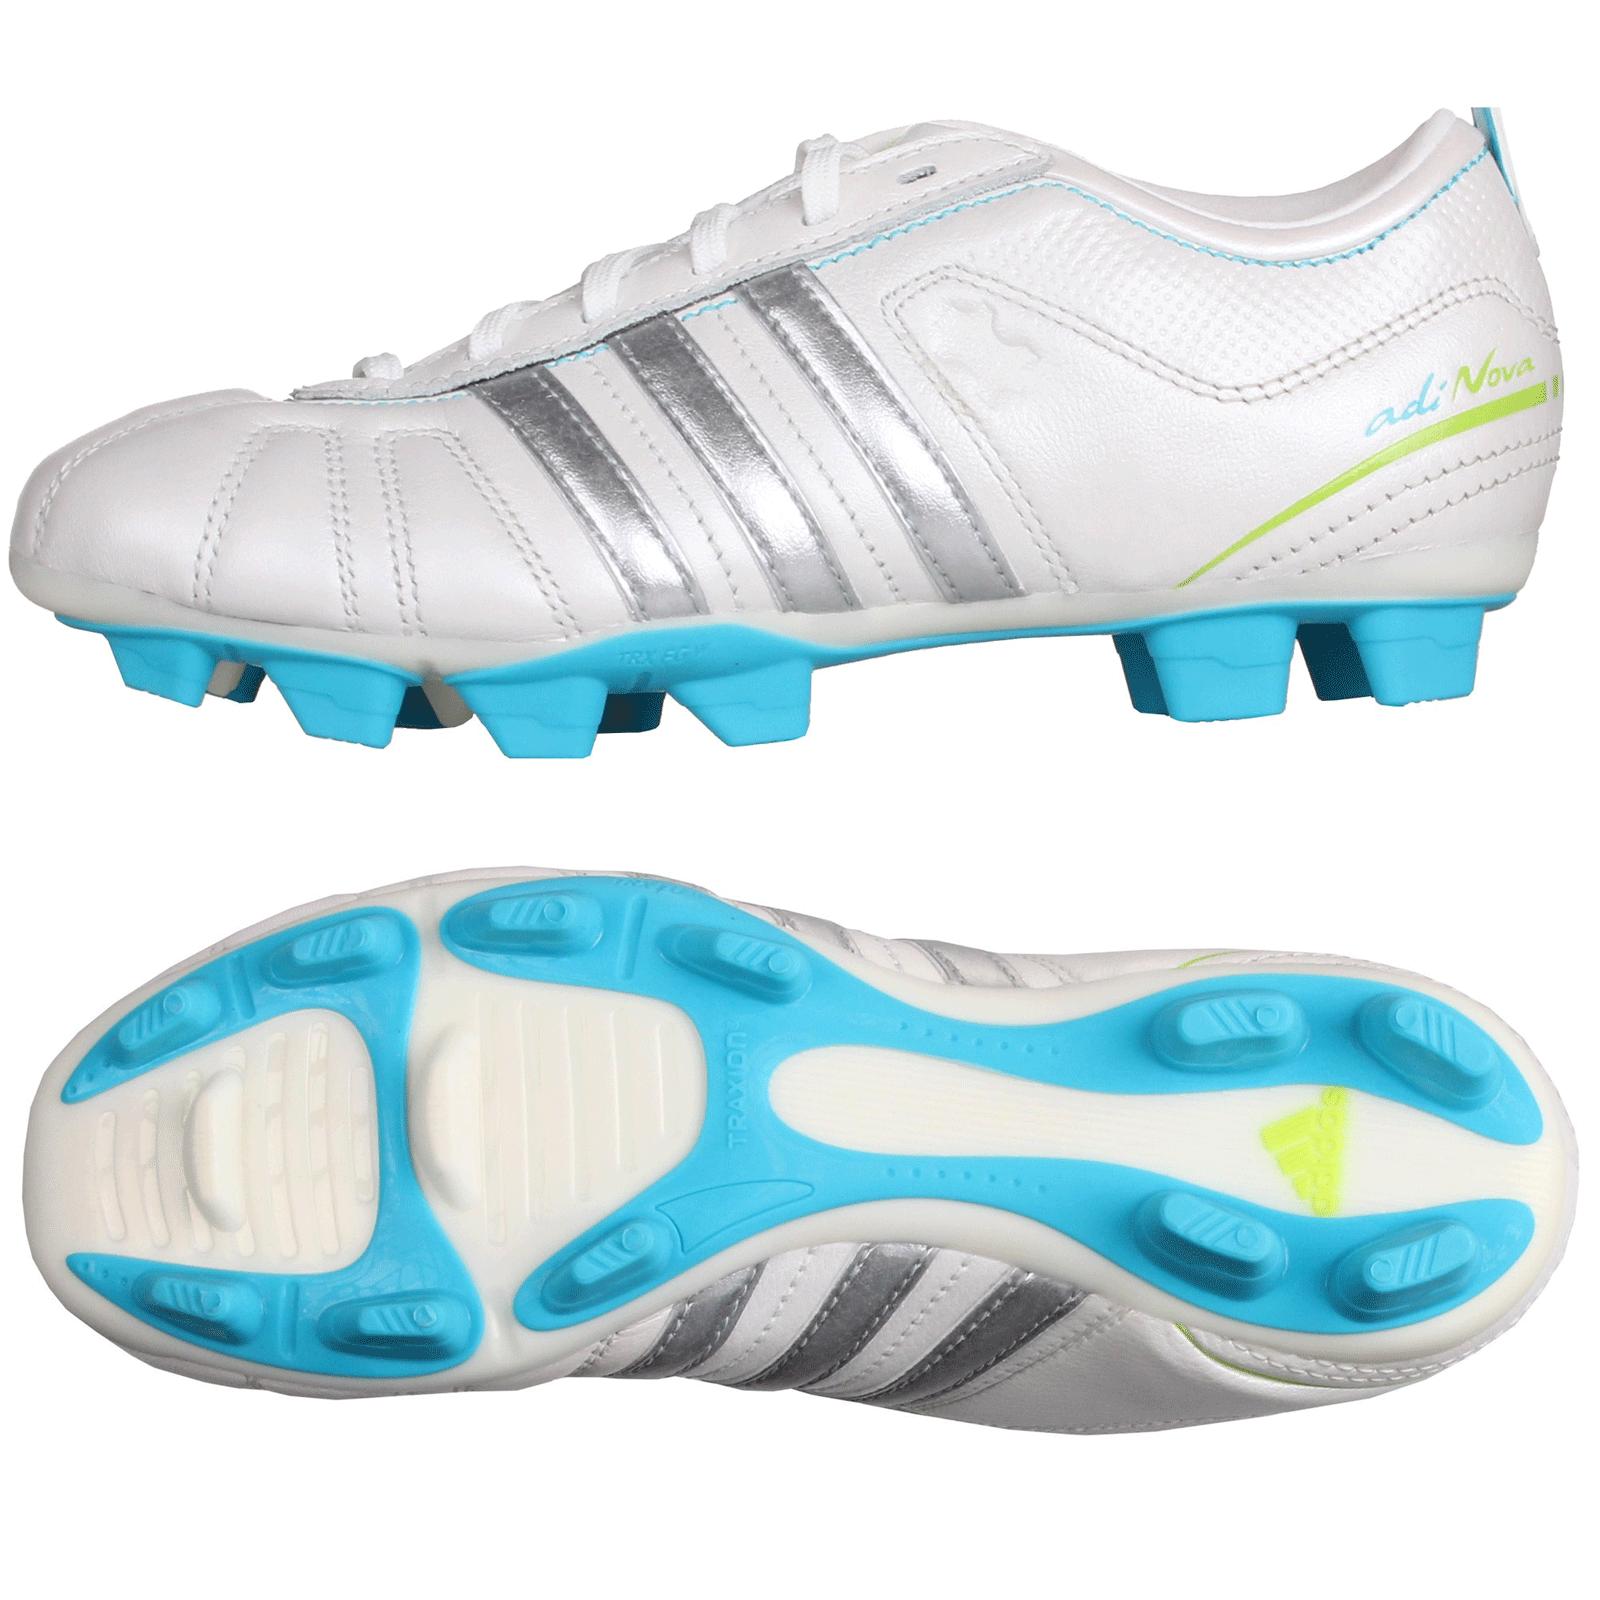 Adidas AdiNova IV TRX FG W femmes football bottes only 4 femmes Soccer chaussures nouveau  Boxed